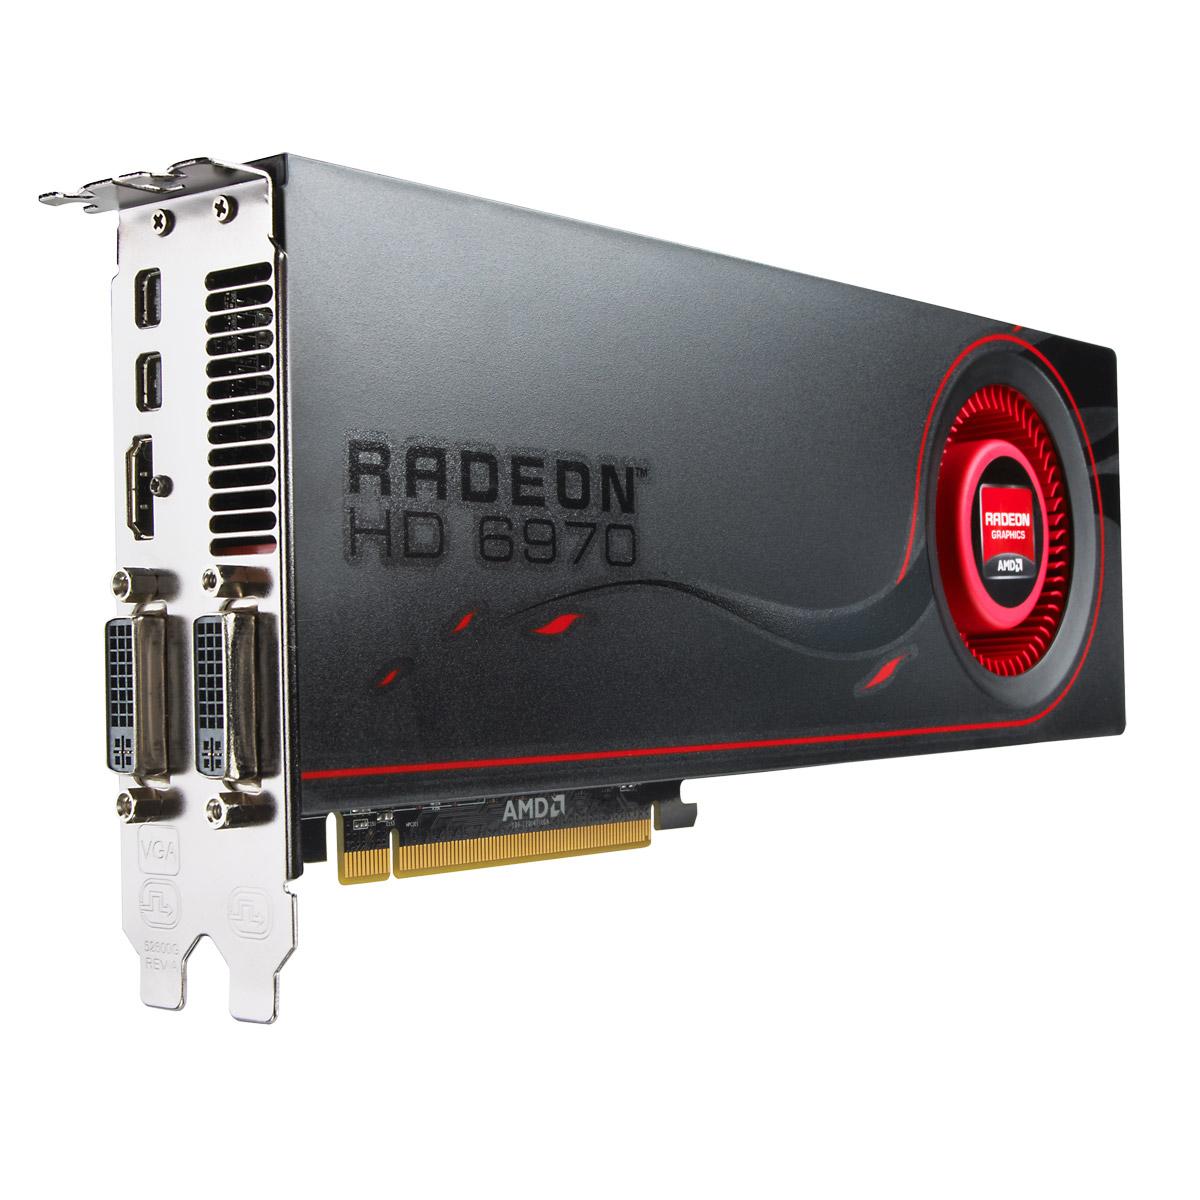 Carte graphique AMD Radeon HD 6970 2 GB 2 Go HDMI/Dual DVI/Dual Mini DisplayPort - PCI Express